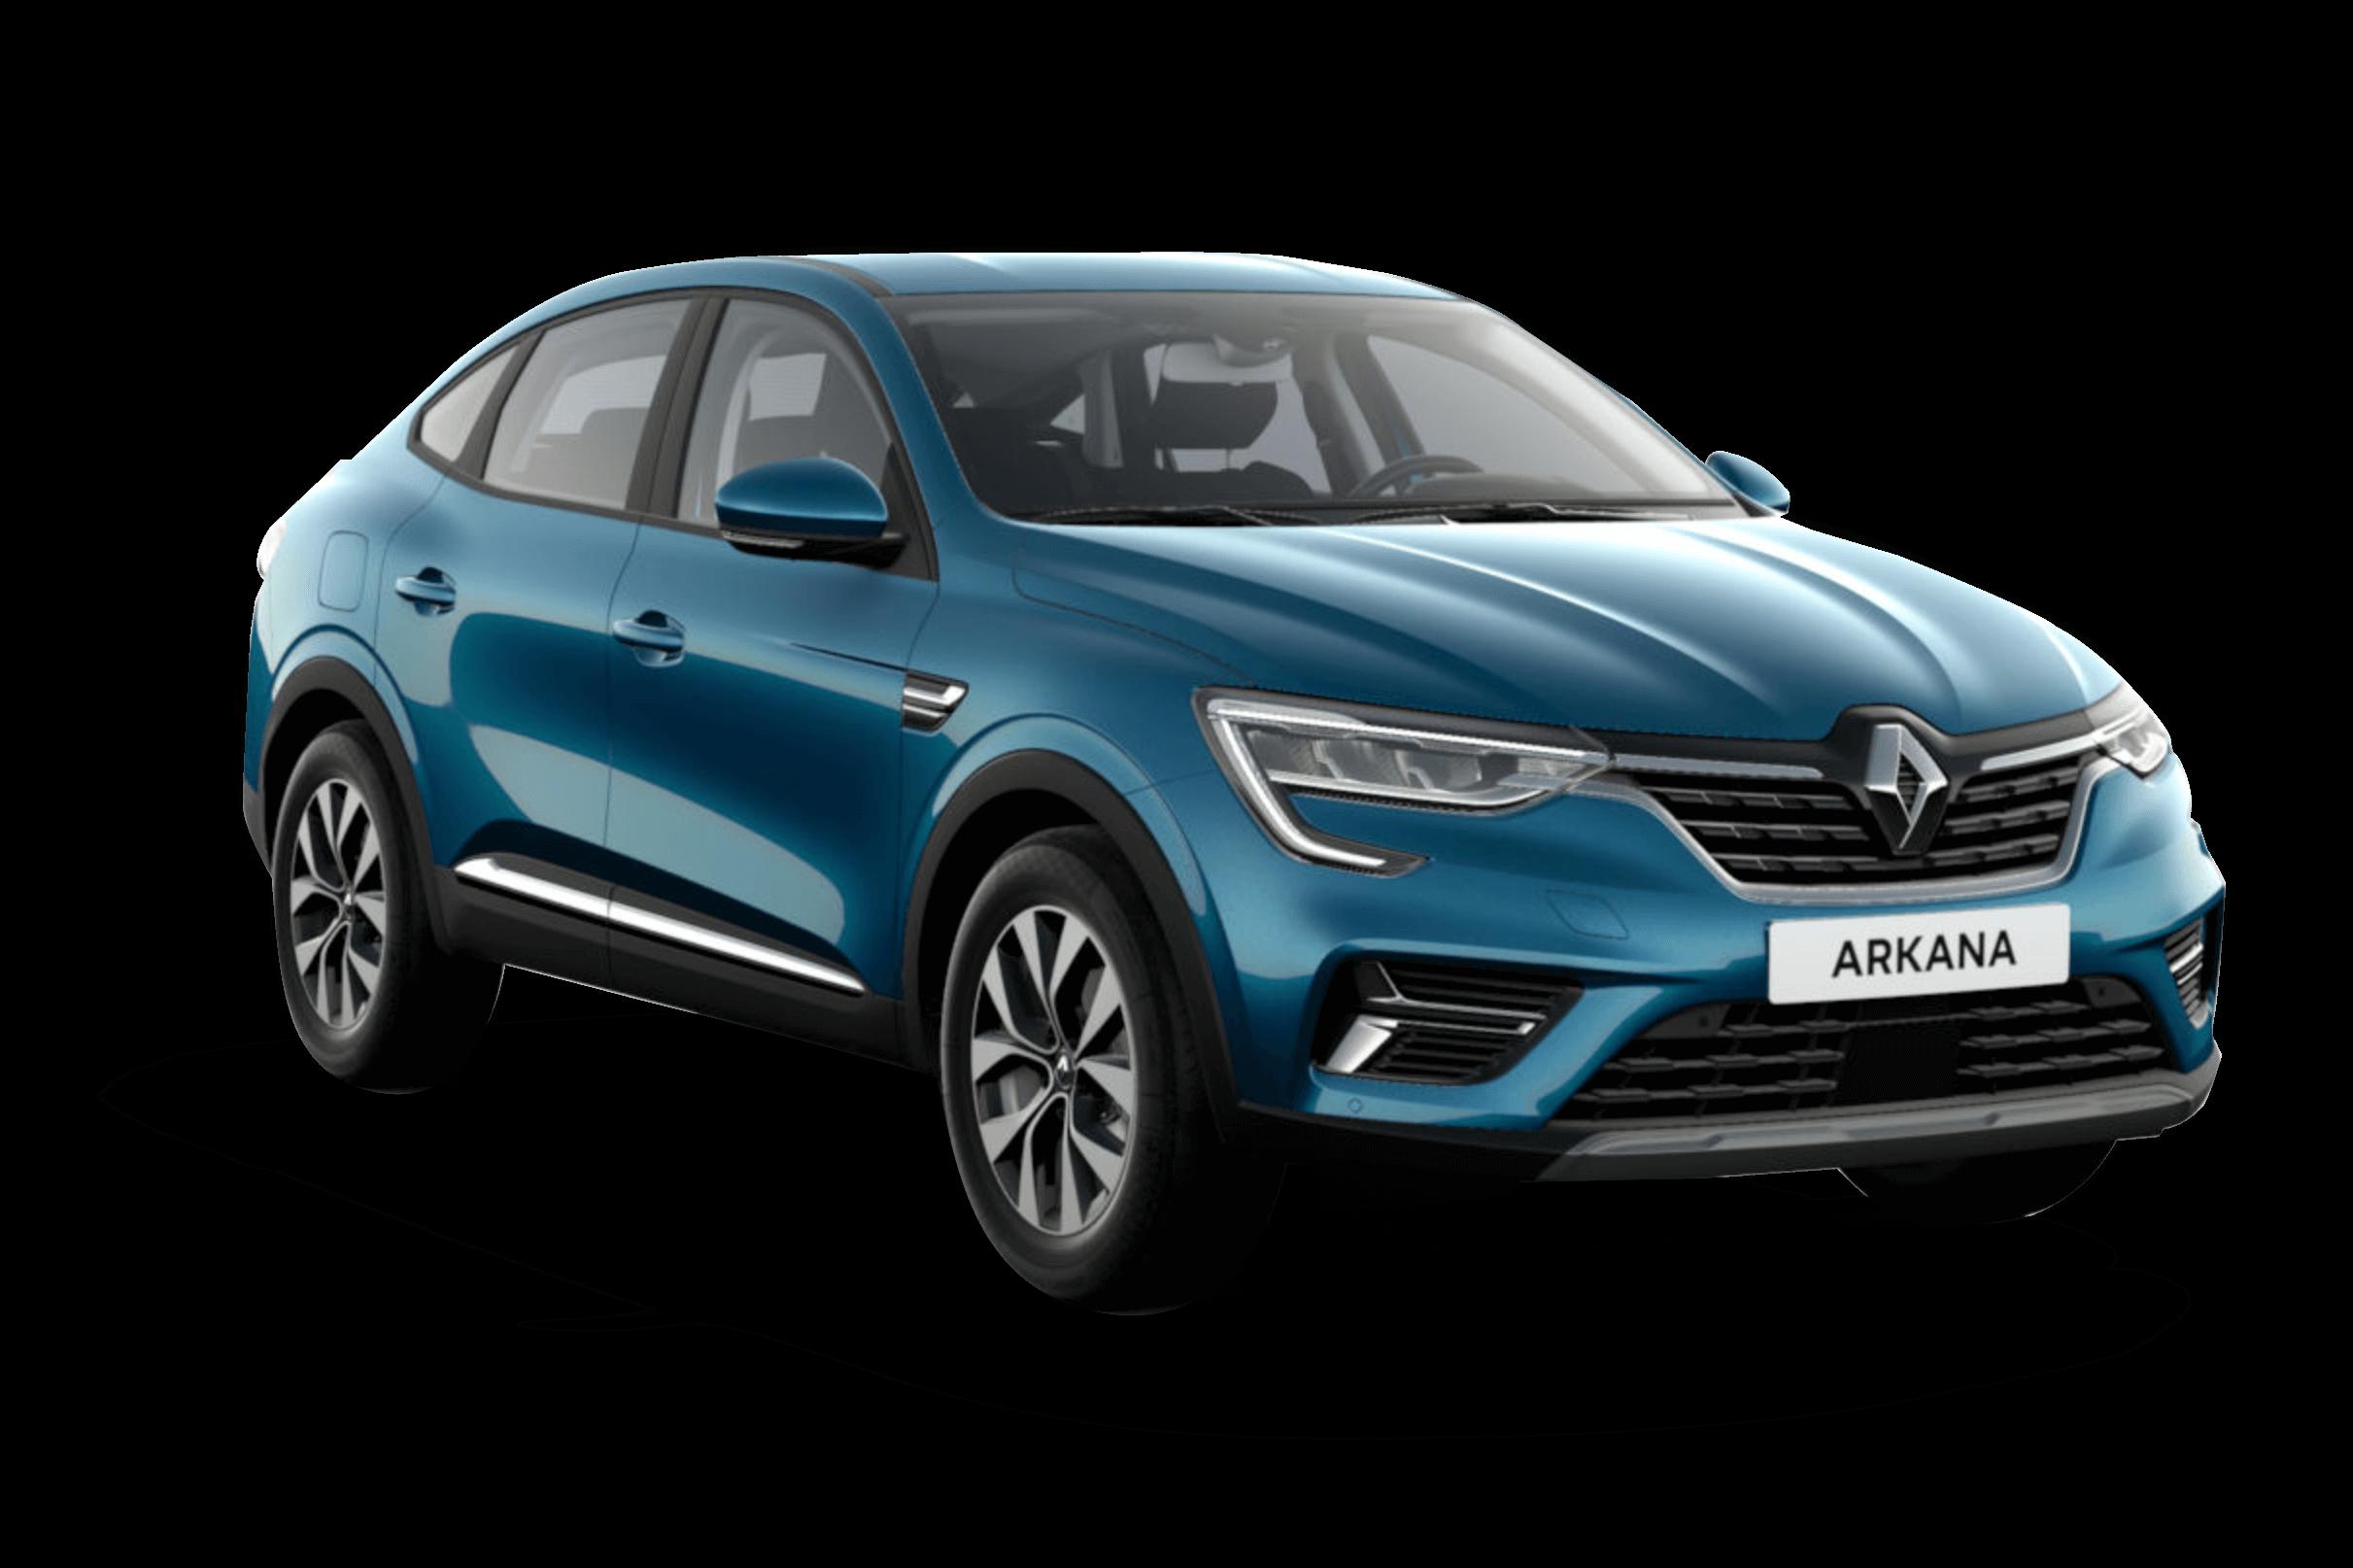 Renault-Arkana-Zen-Blå-Zanzibar